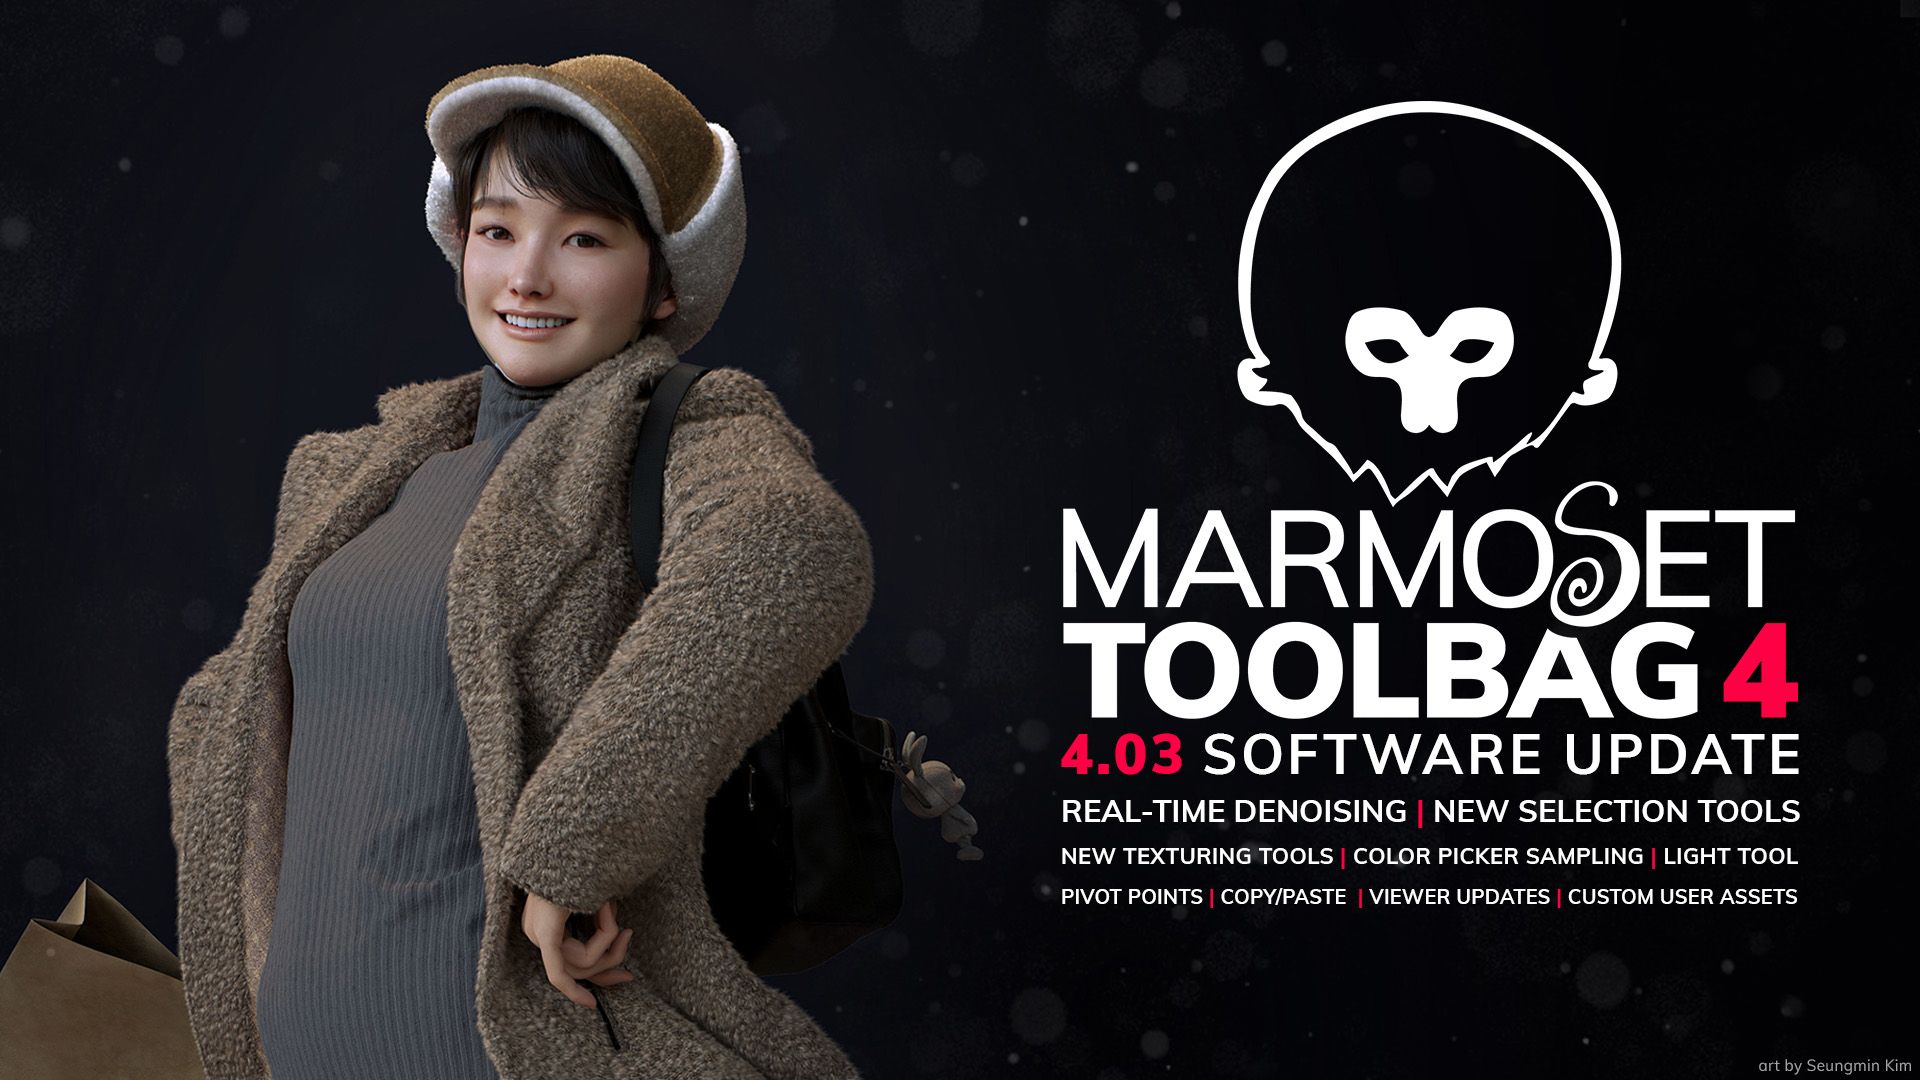 Marmoset Toolbag 4.03版本发布 新版本功能介绍